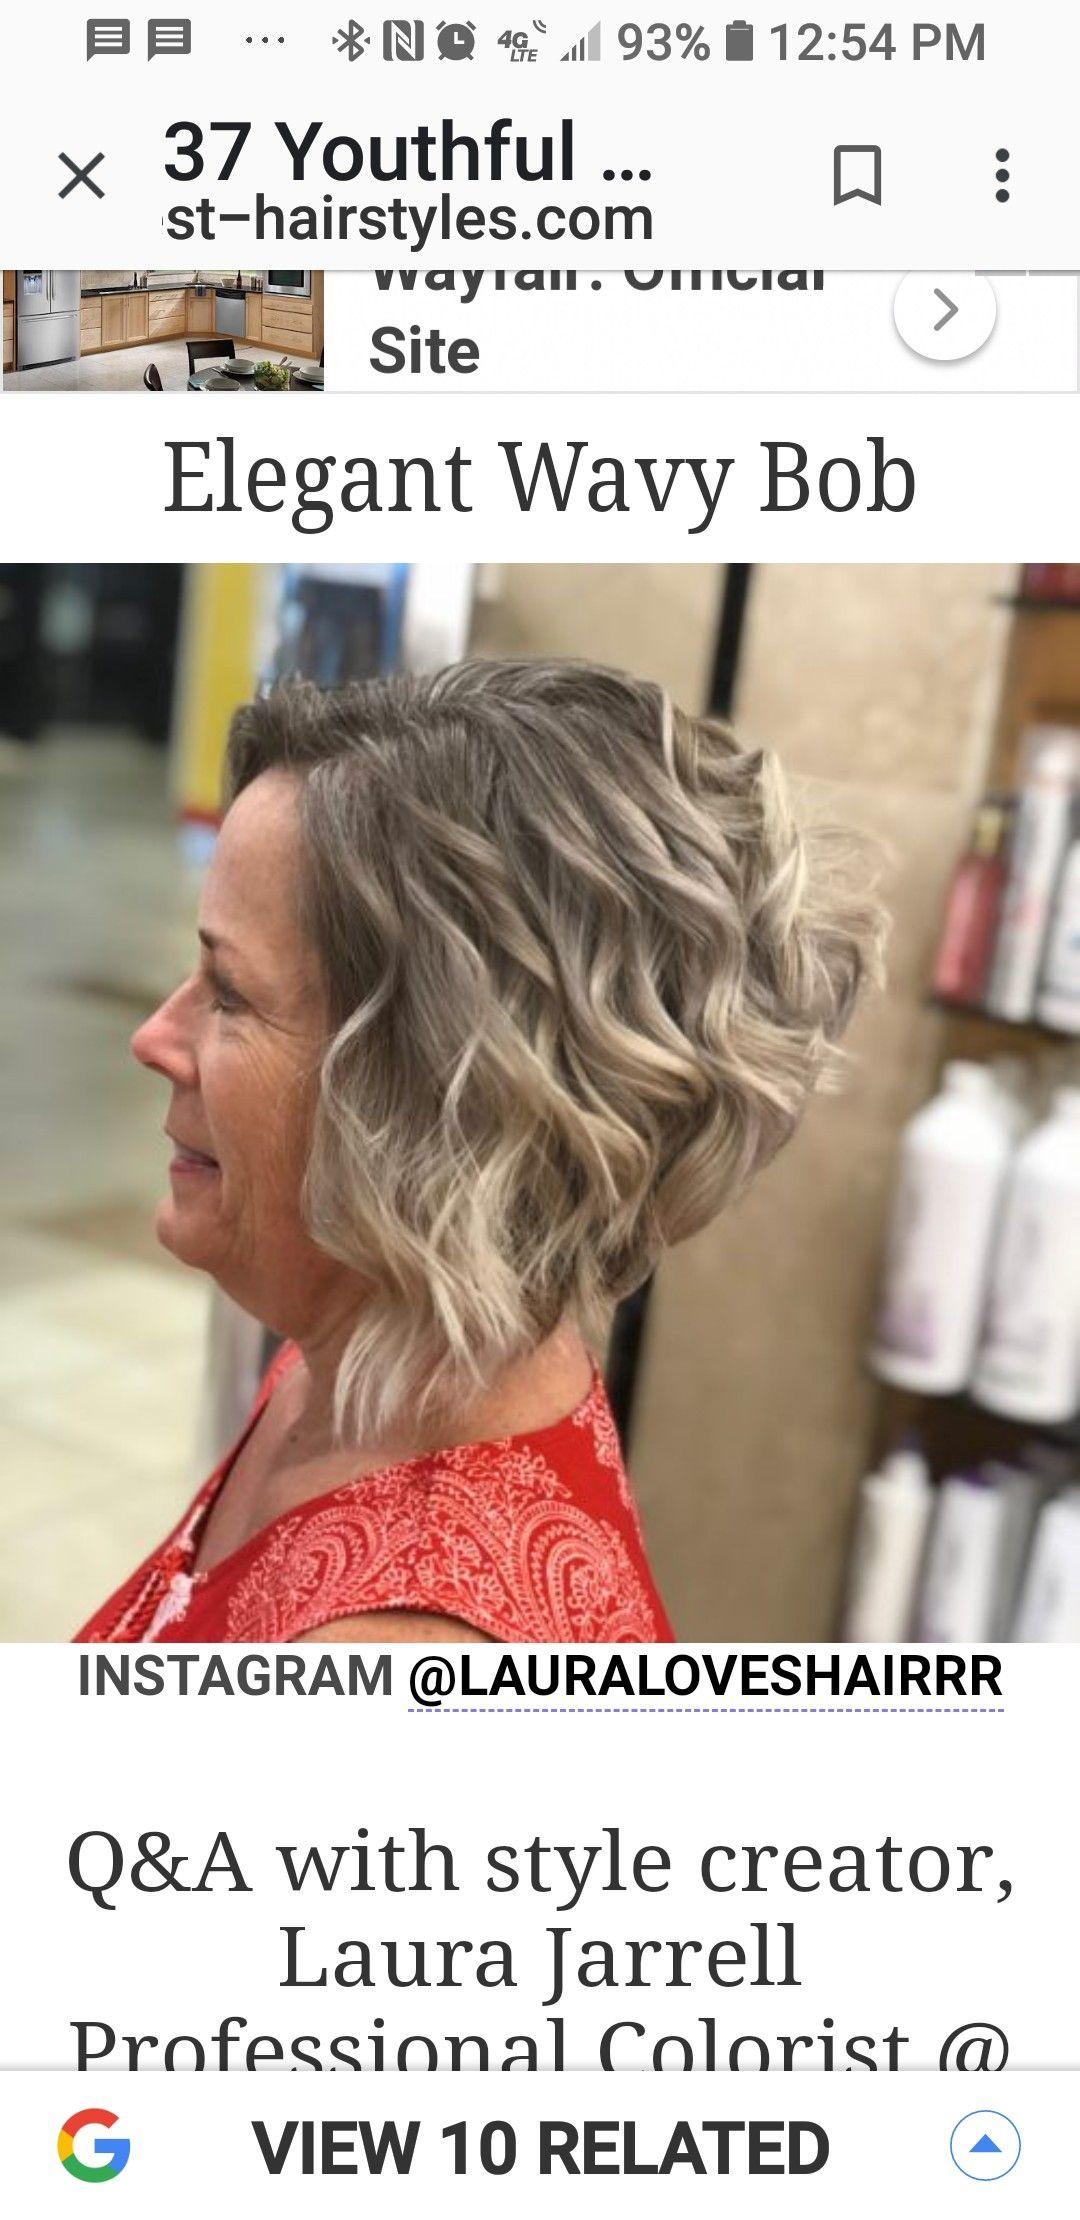 Pin By Lori Truesdell On Hairstyles Bob Instagram Wavy Bobs Hair Styles